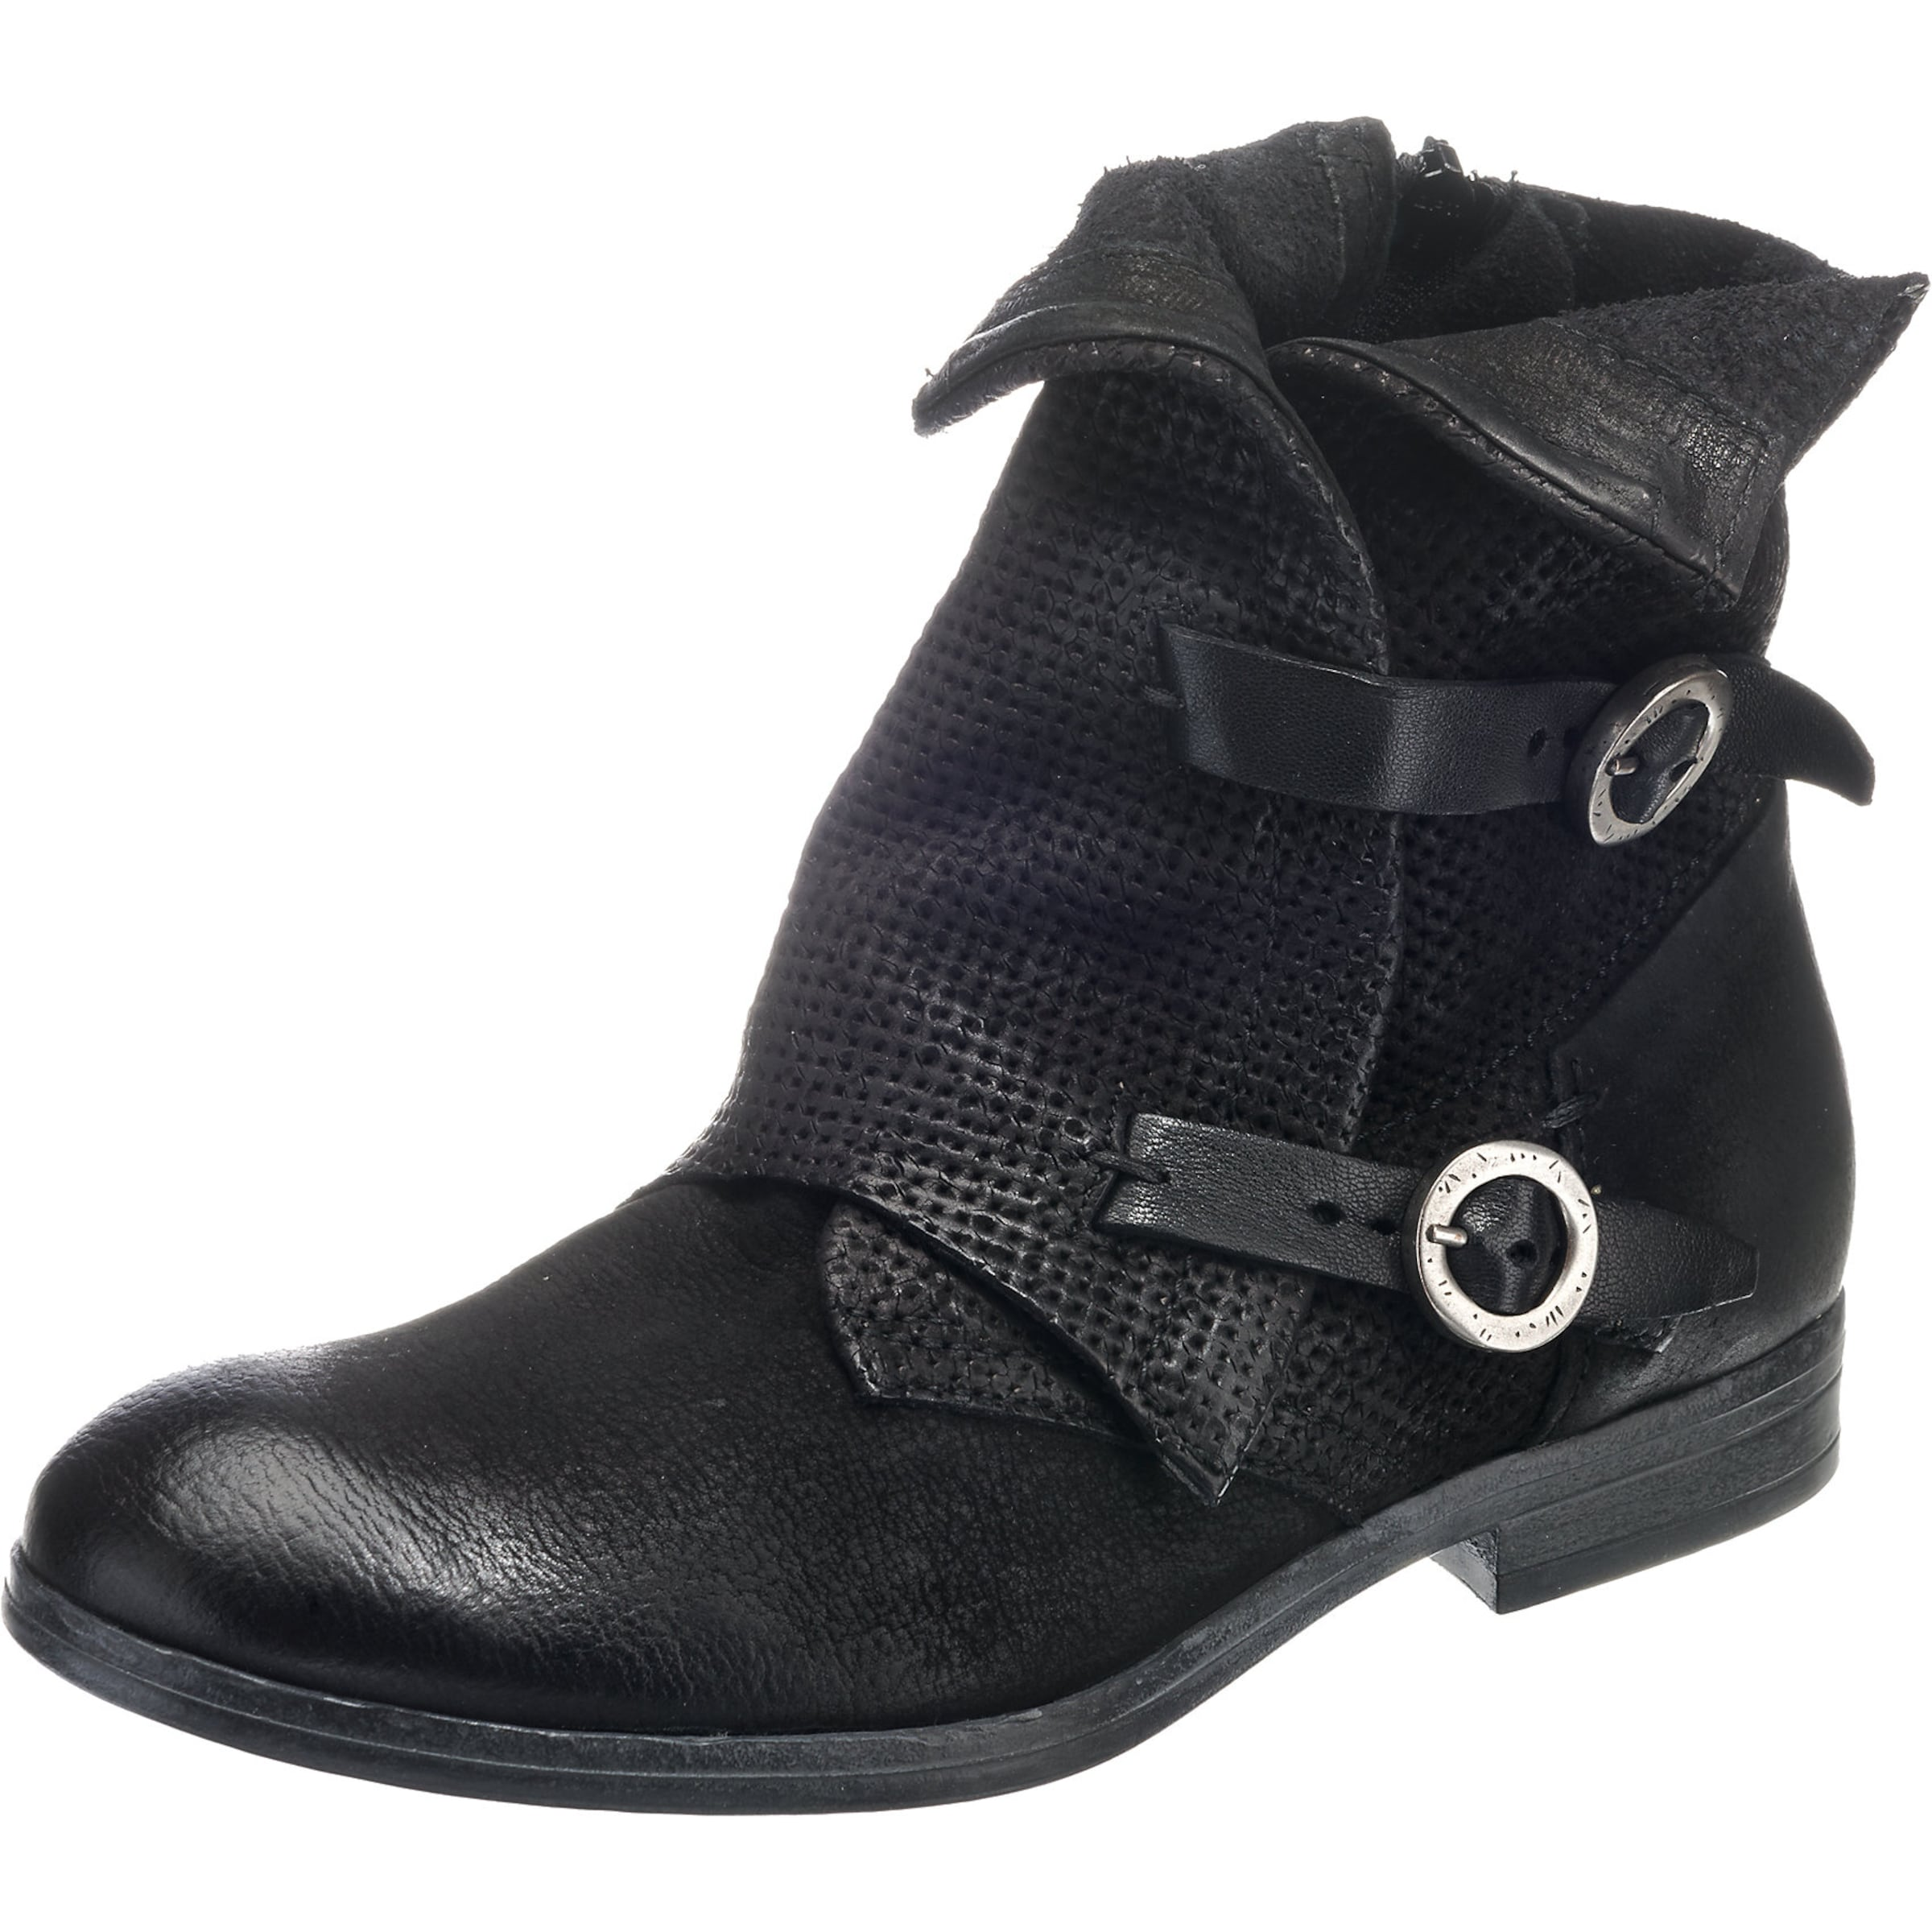 MJUS Klassische Stiefeletten Nicole-Nicca Verschleißfeste billige Schuhe